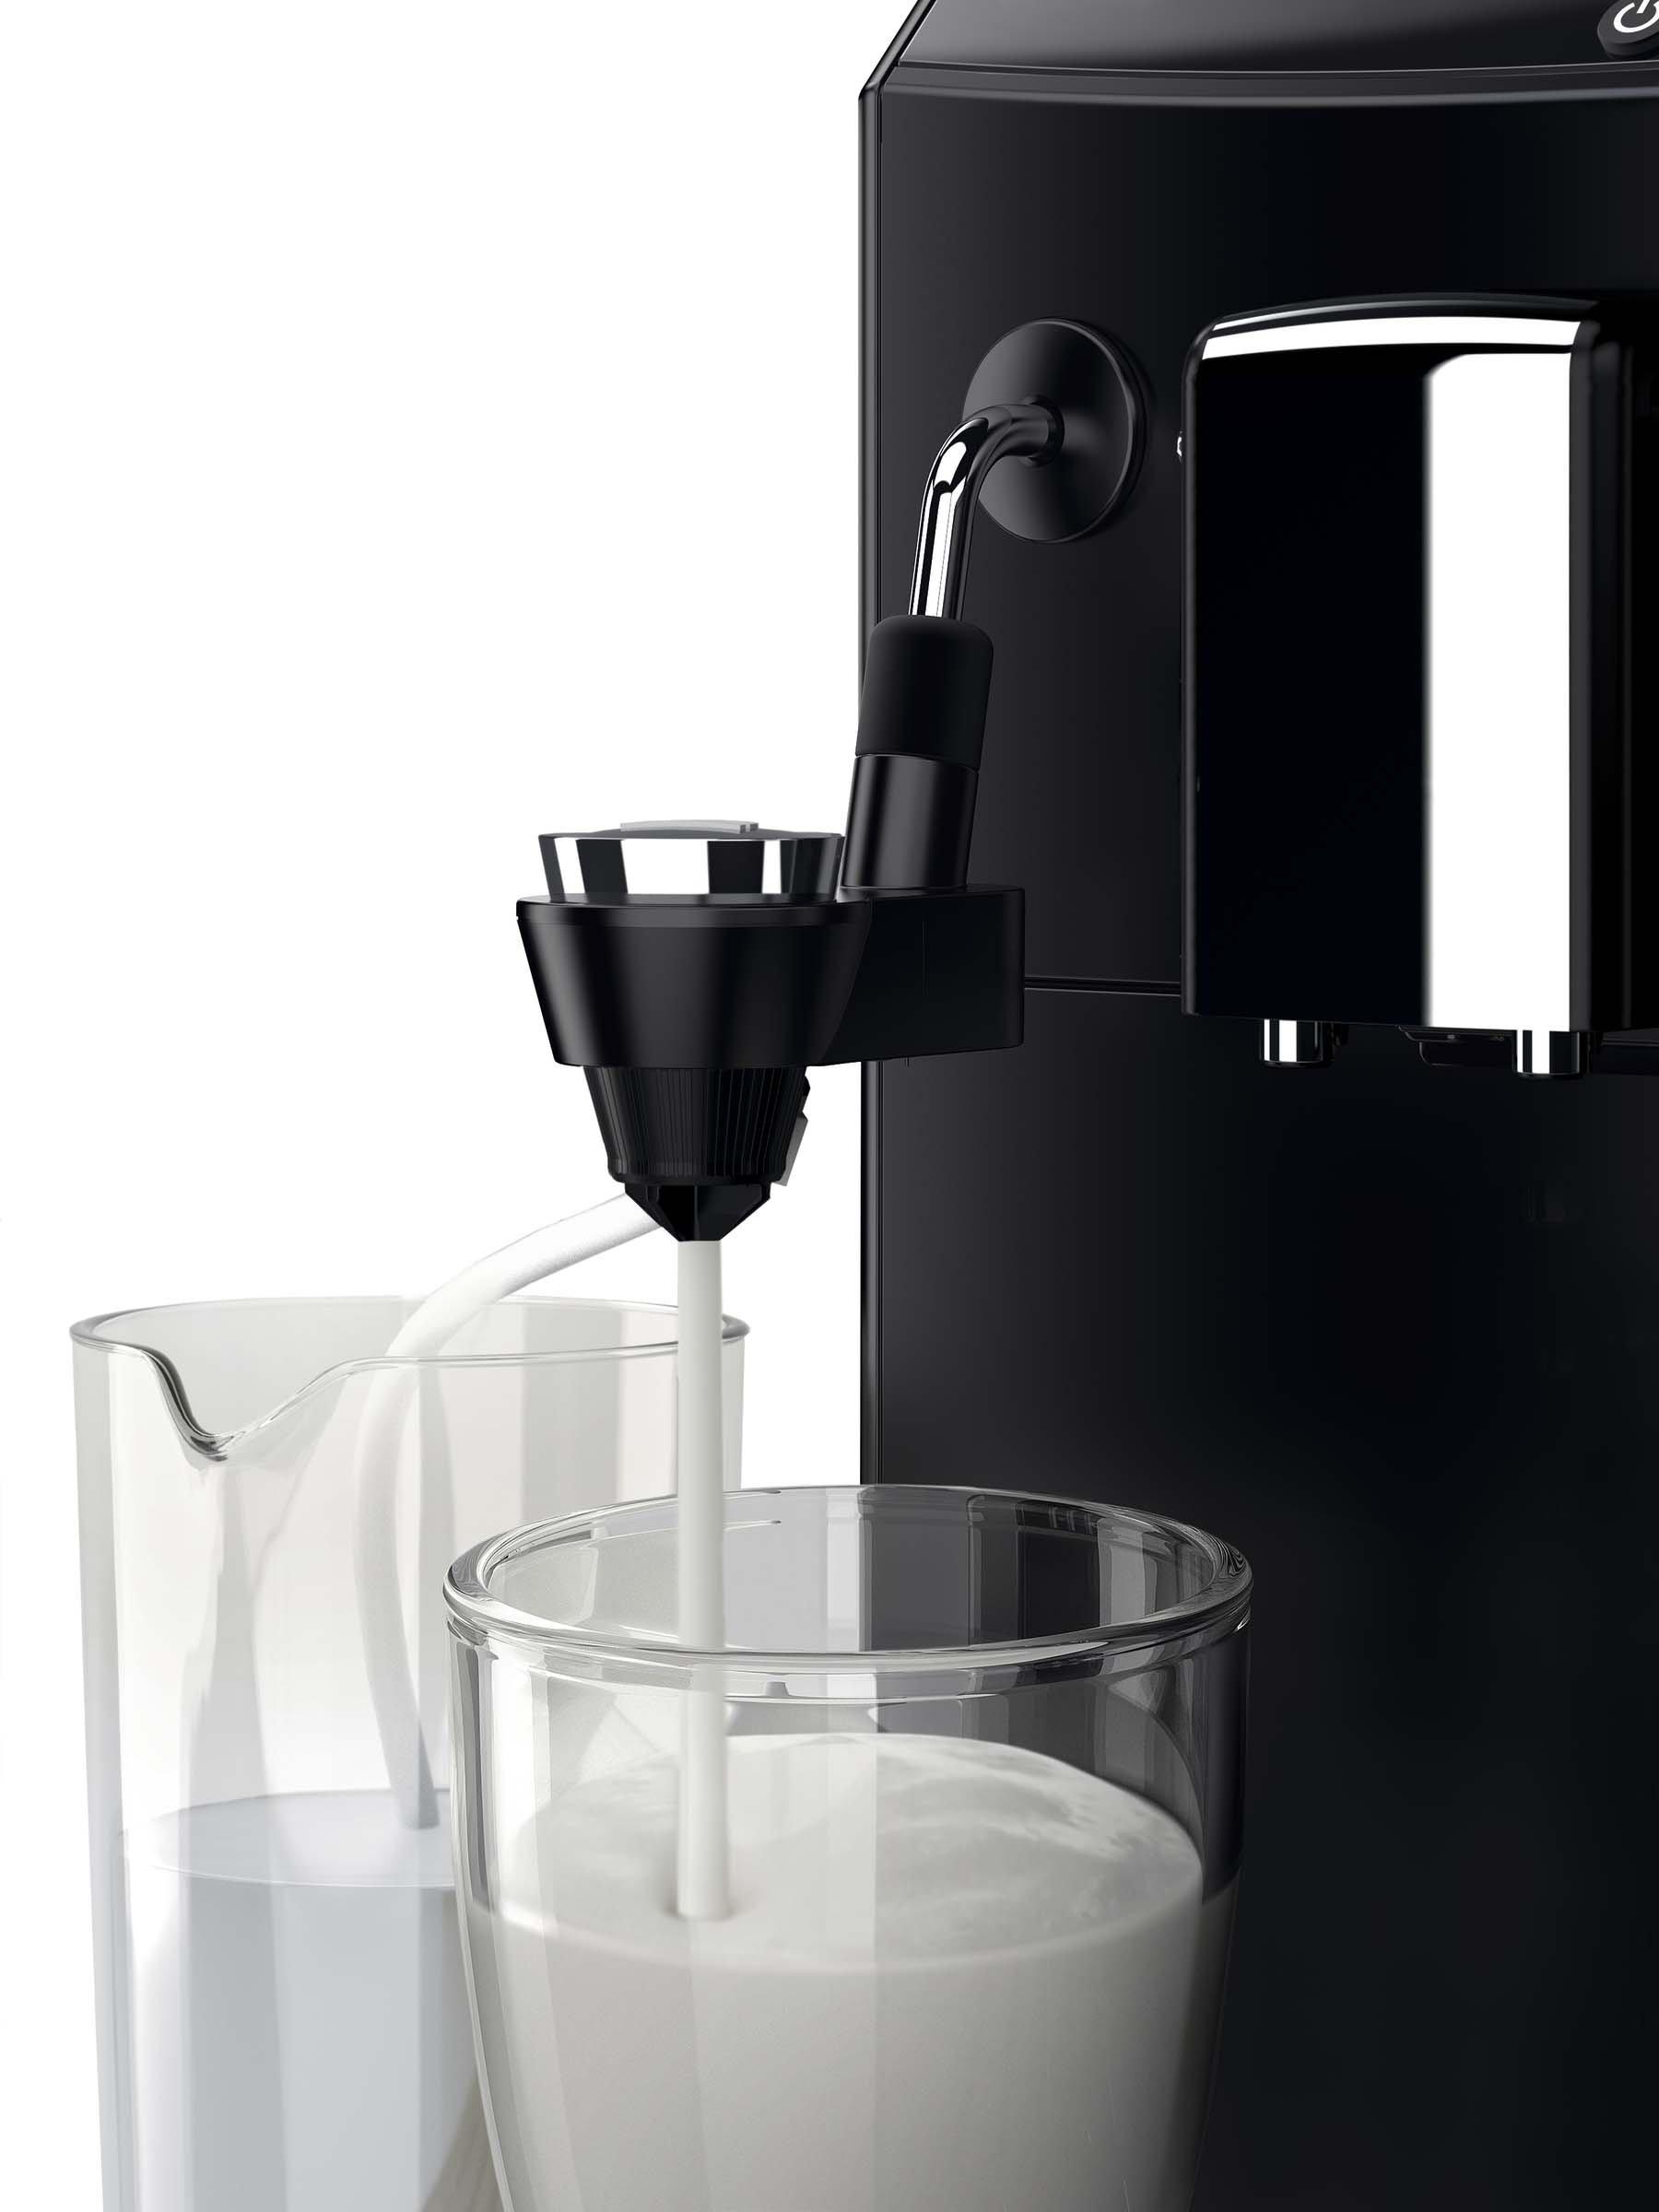 Philips-HD882401-Kaffeevollautomat-espresso-Serie-3000-AMF-Cappuccinatore-schwarz